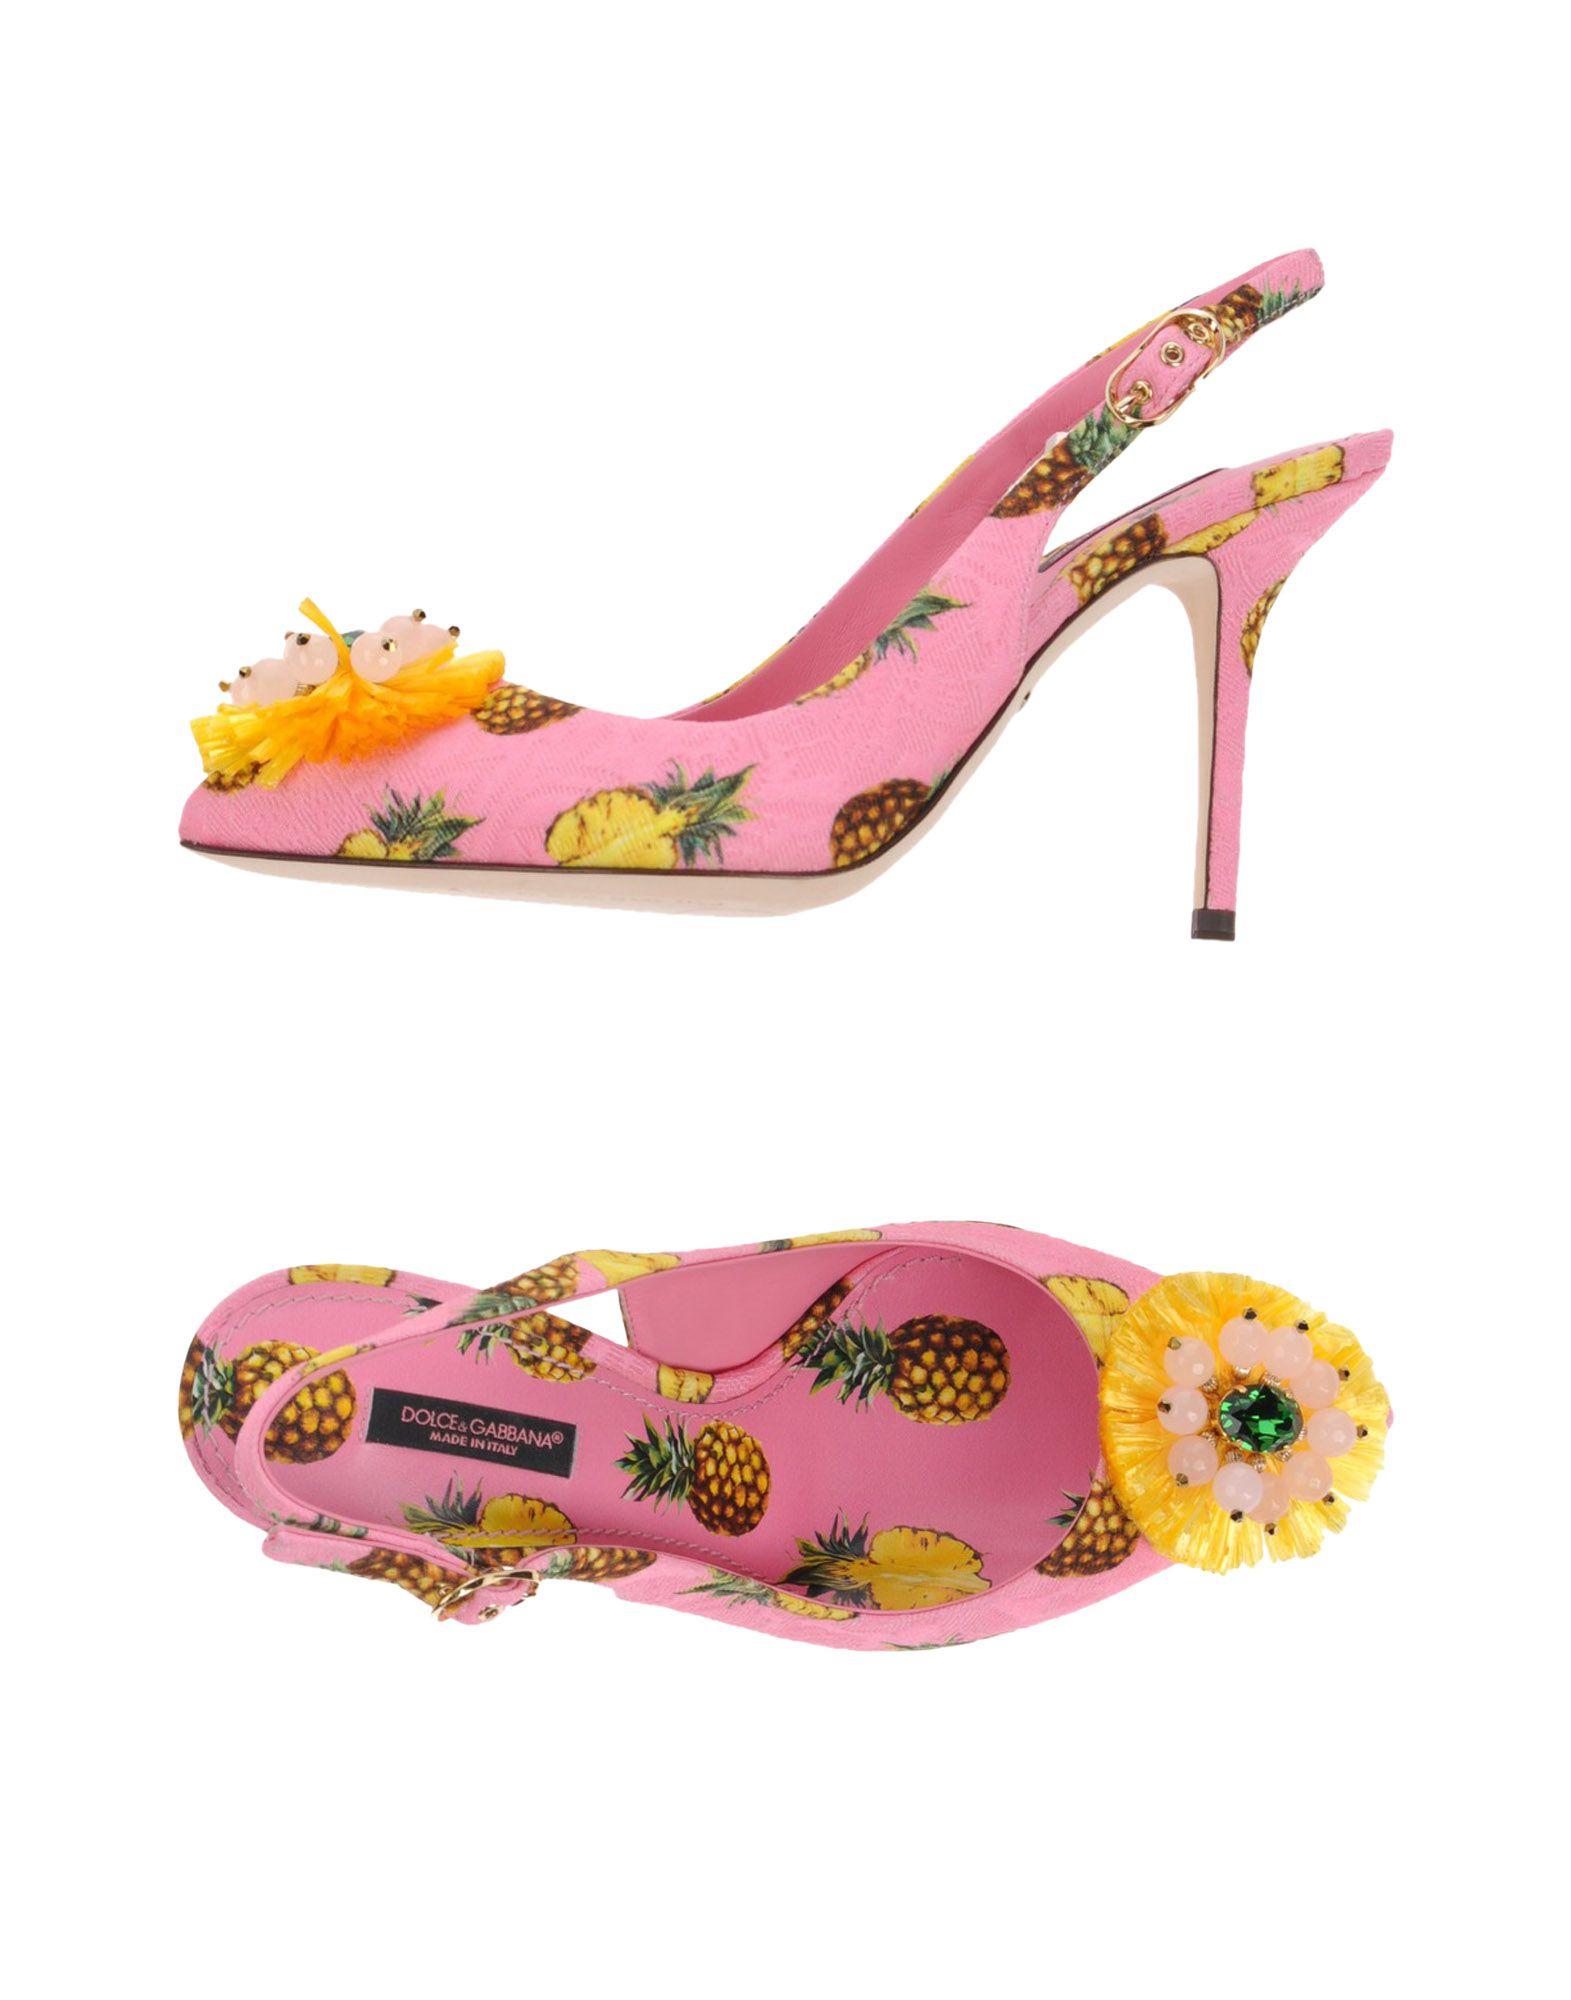 Décolleté Dolce & Gabbana Donna - 11362871TN